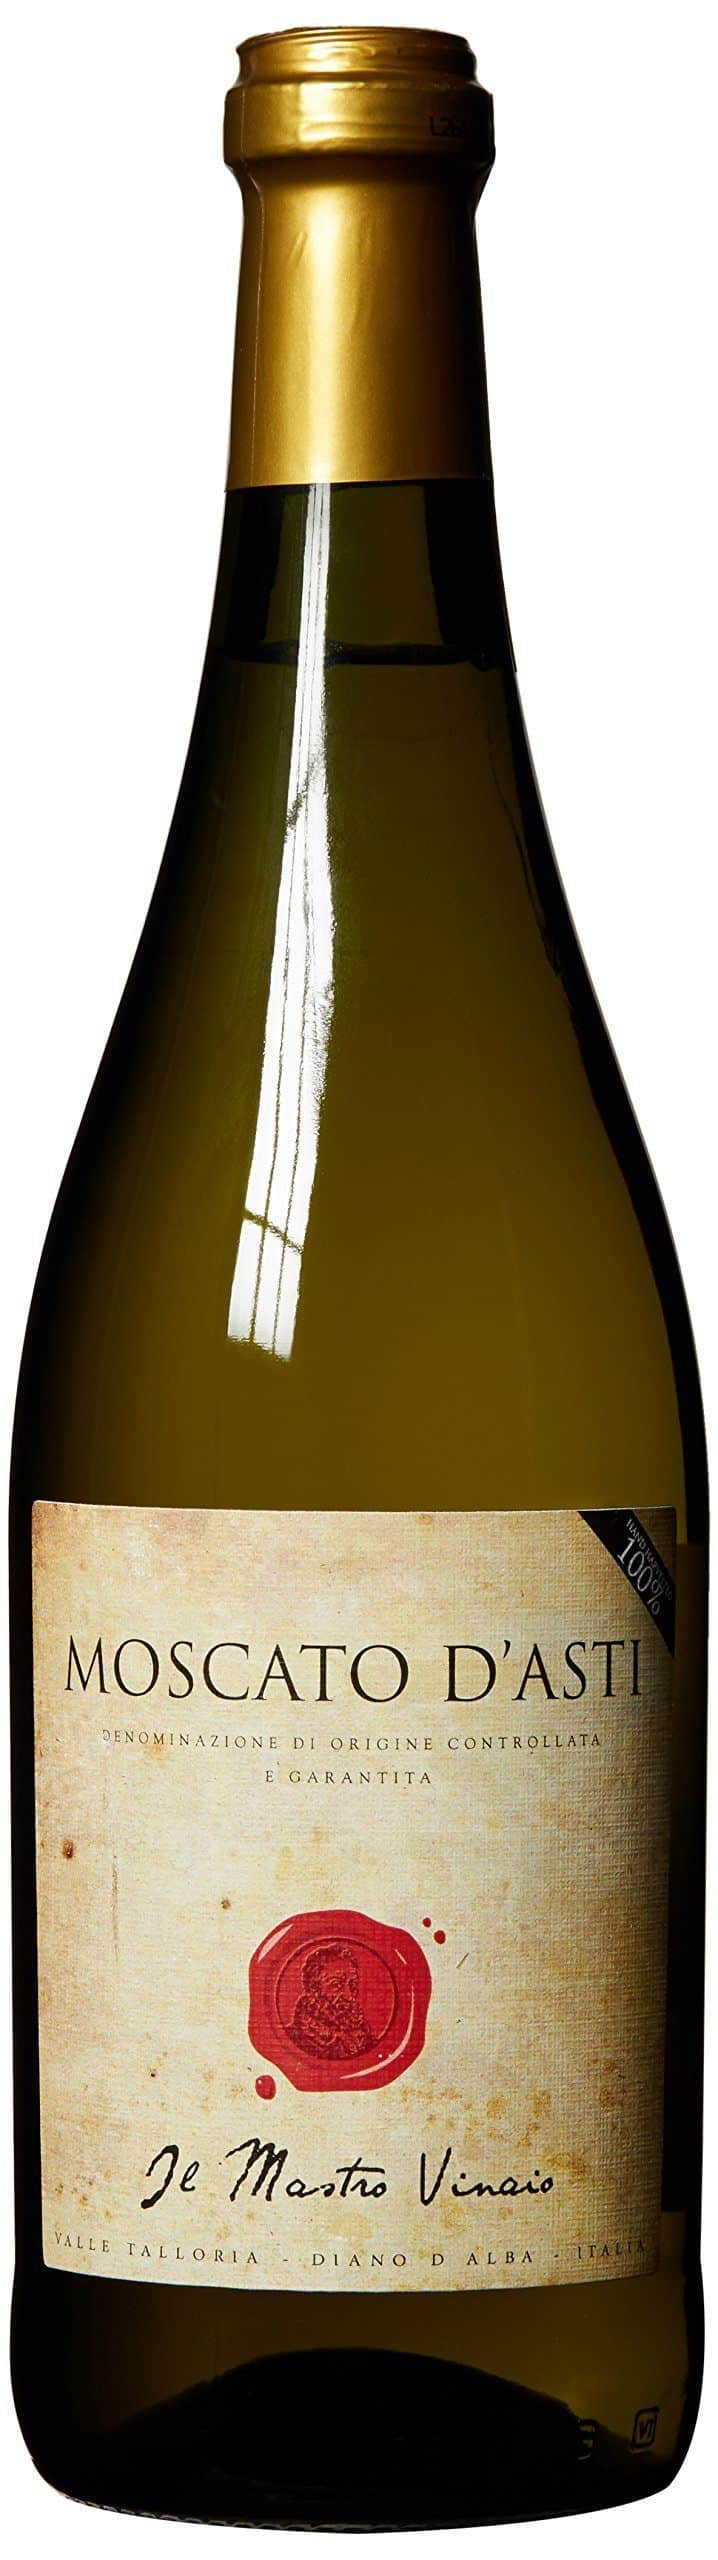 2013 Mastro Vinaio Moscato D'Asti Wine